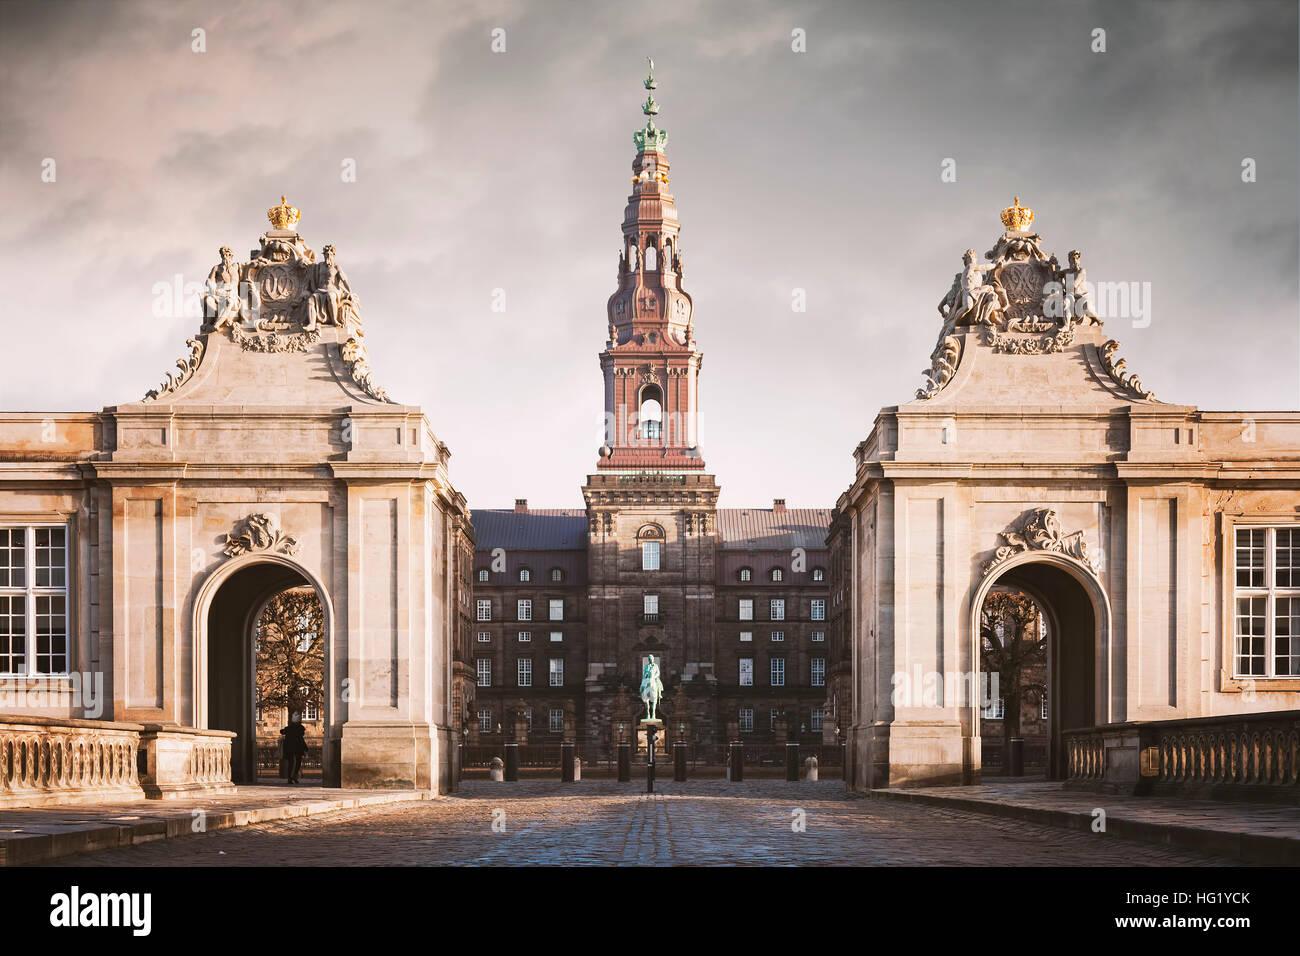 Image of the grand entry to Christiansborg castle in Copenhagen, Denmark. - Stock Image